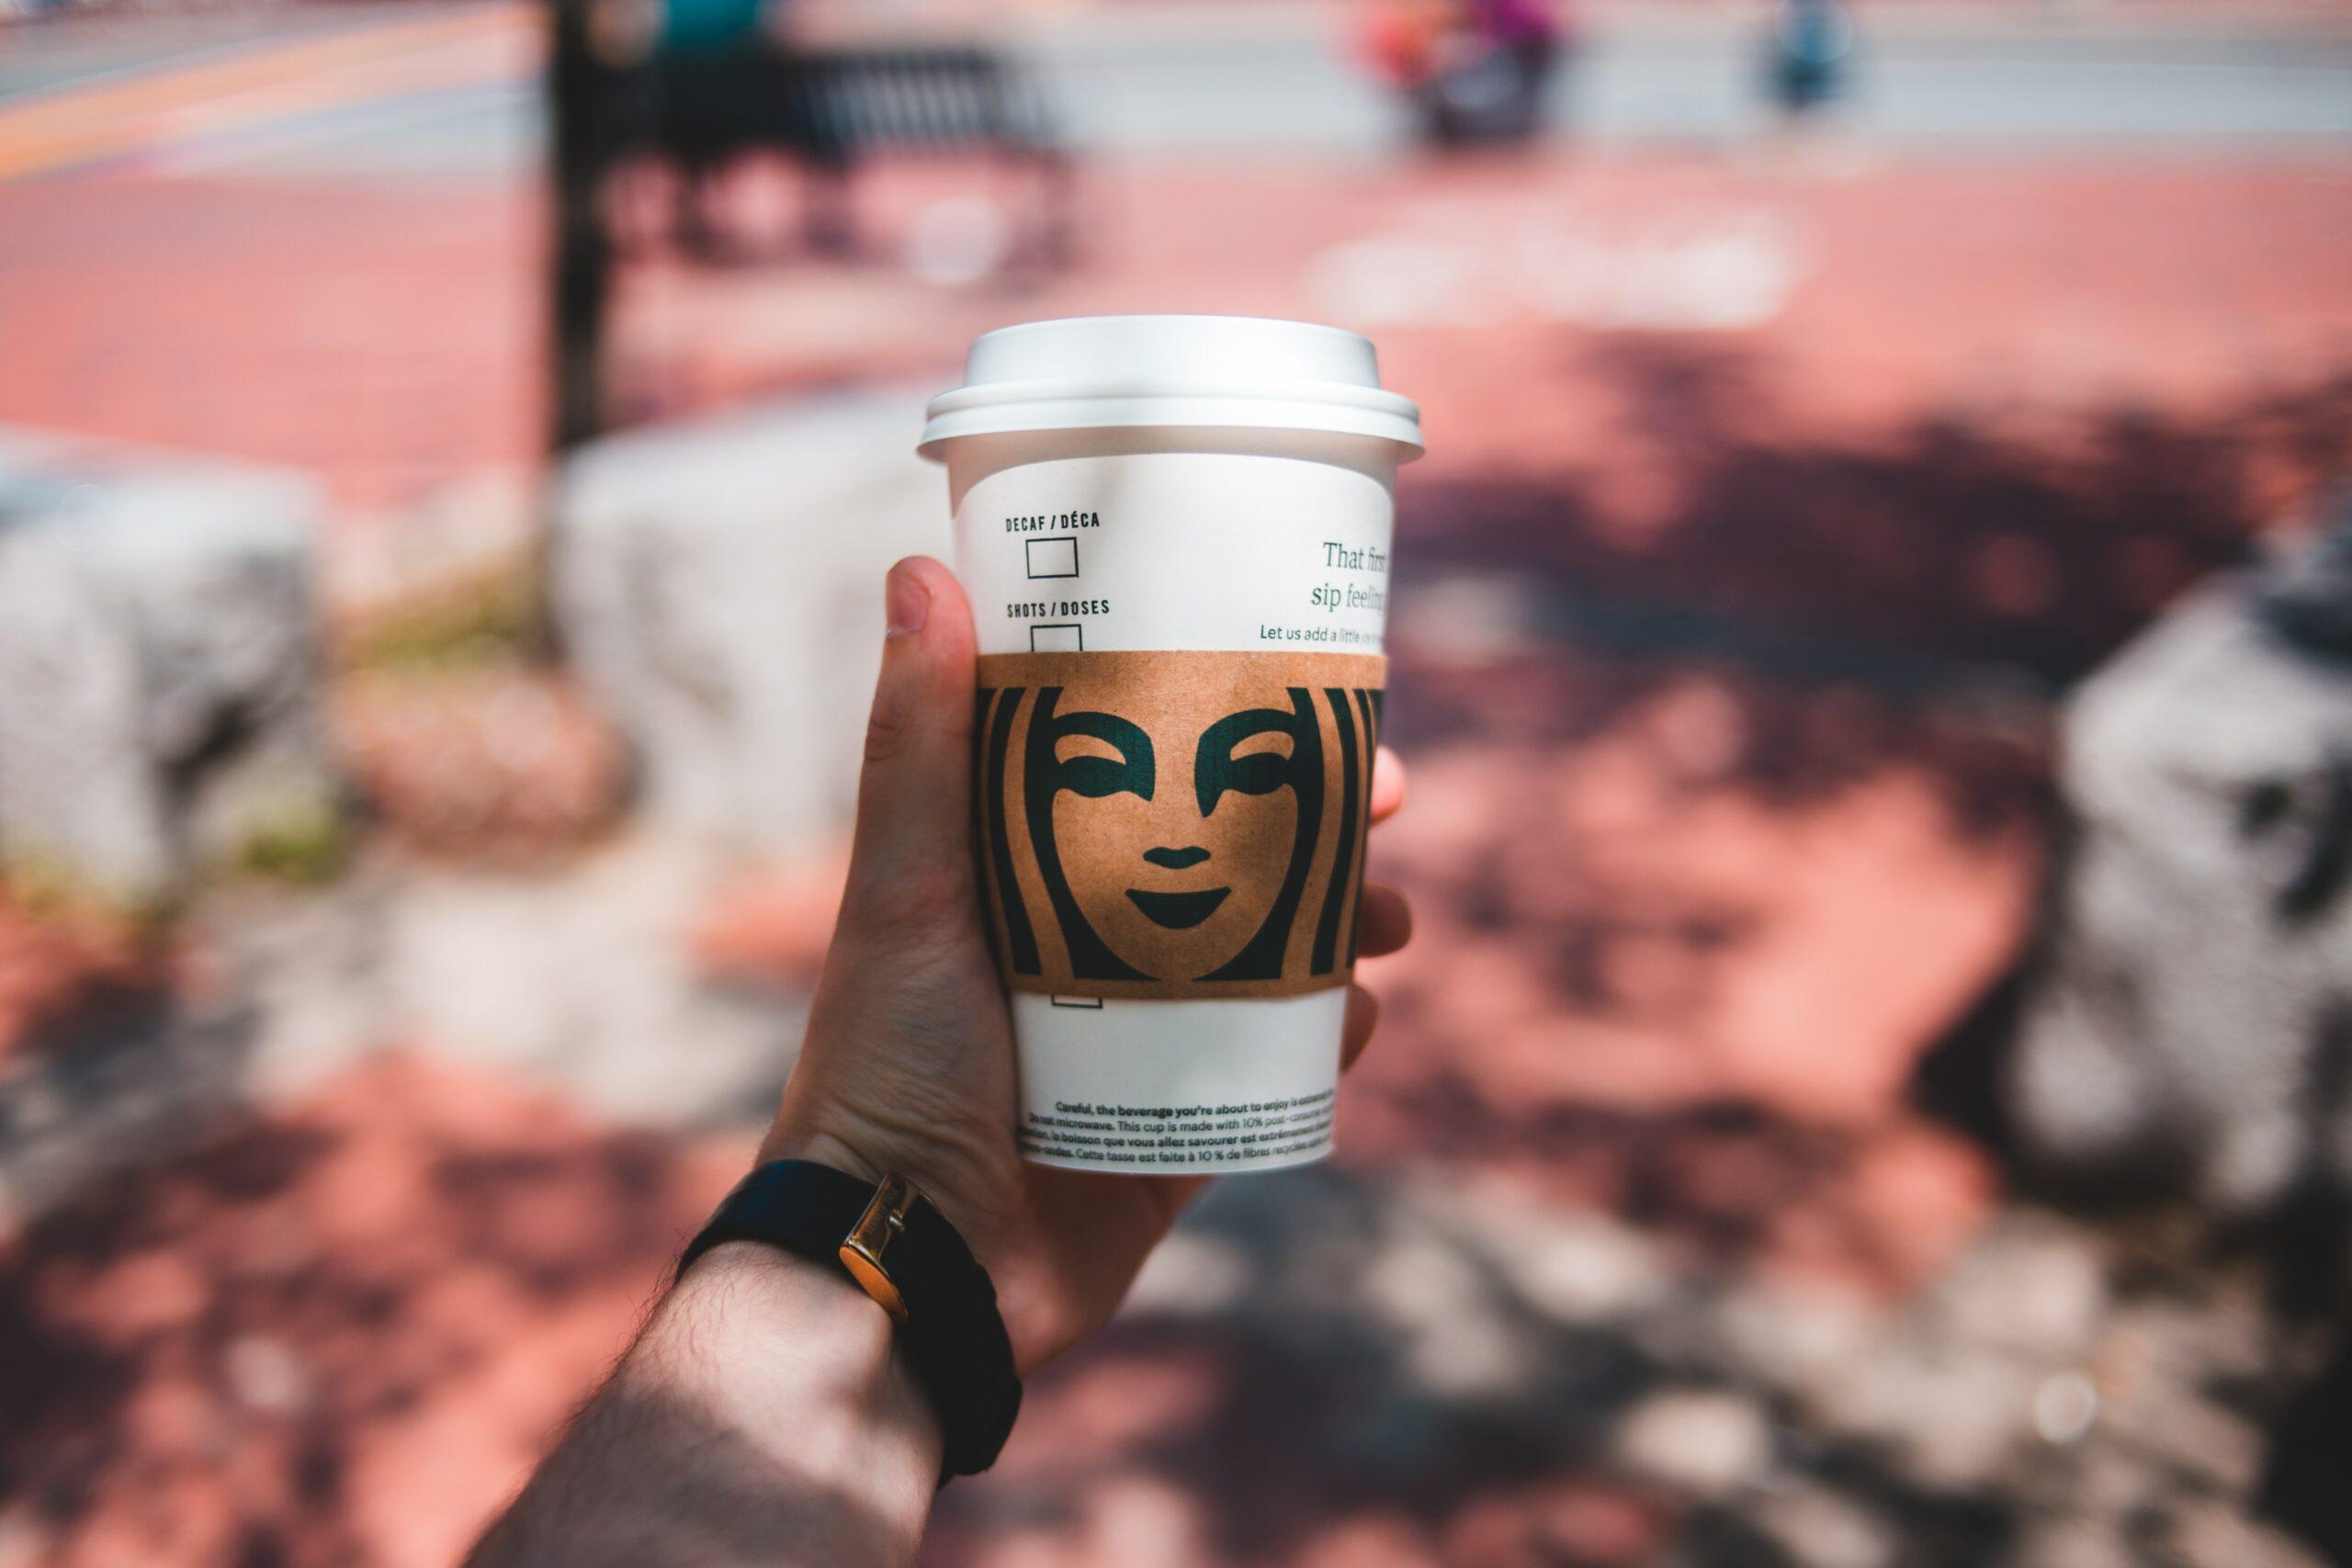 Duurzaam Toerisme: Weg met het ketentoerisme - byebye Starbucks & McDonalds